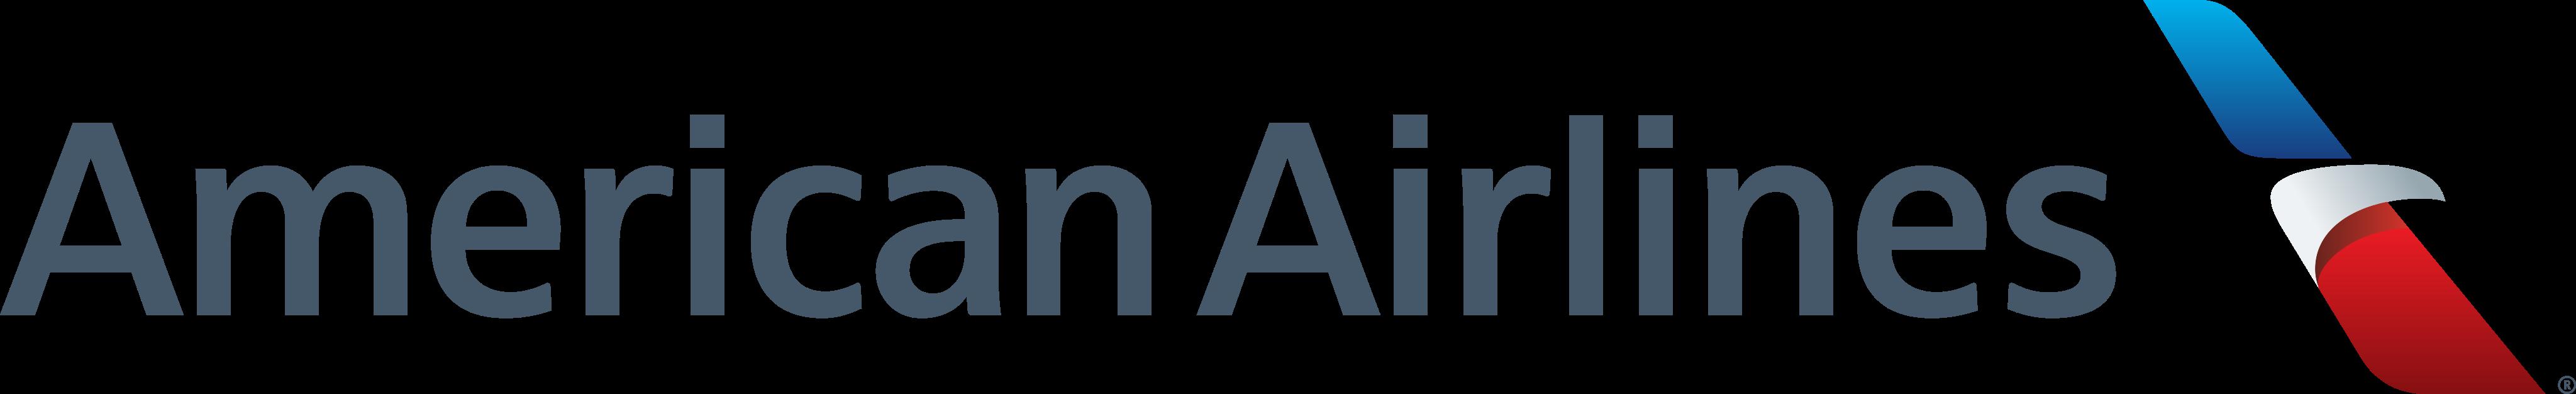 american airlines logo - American Airlines Logo